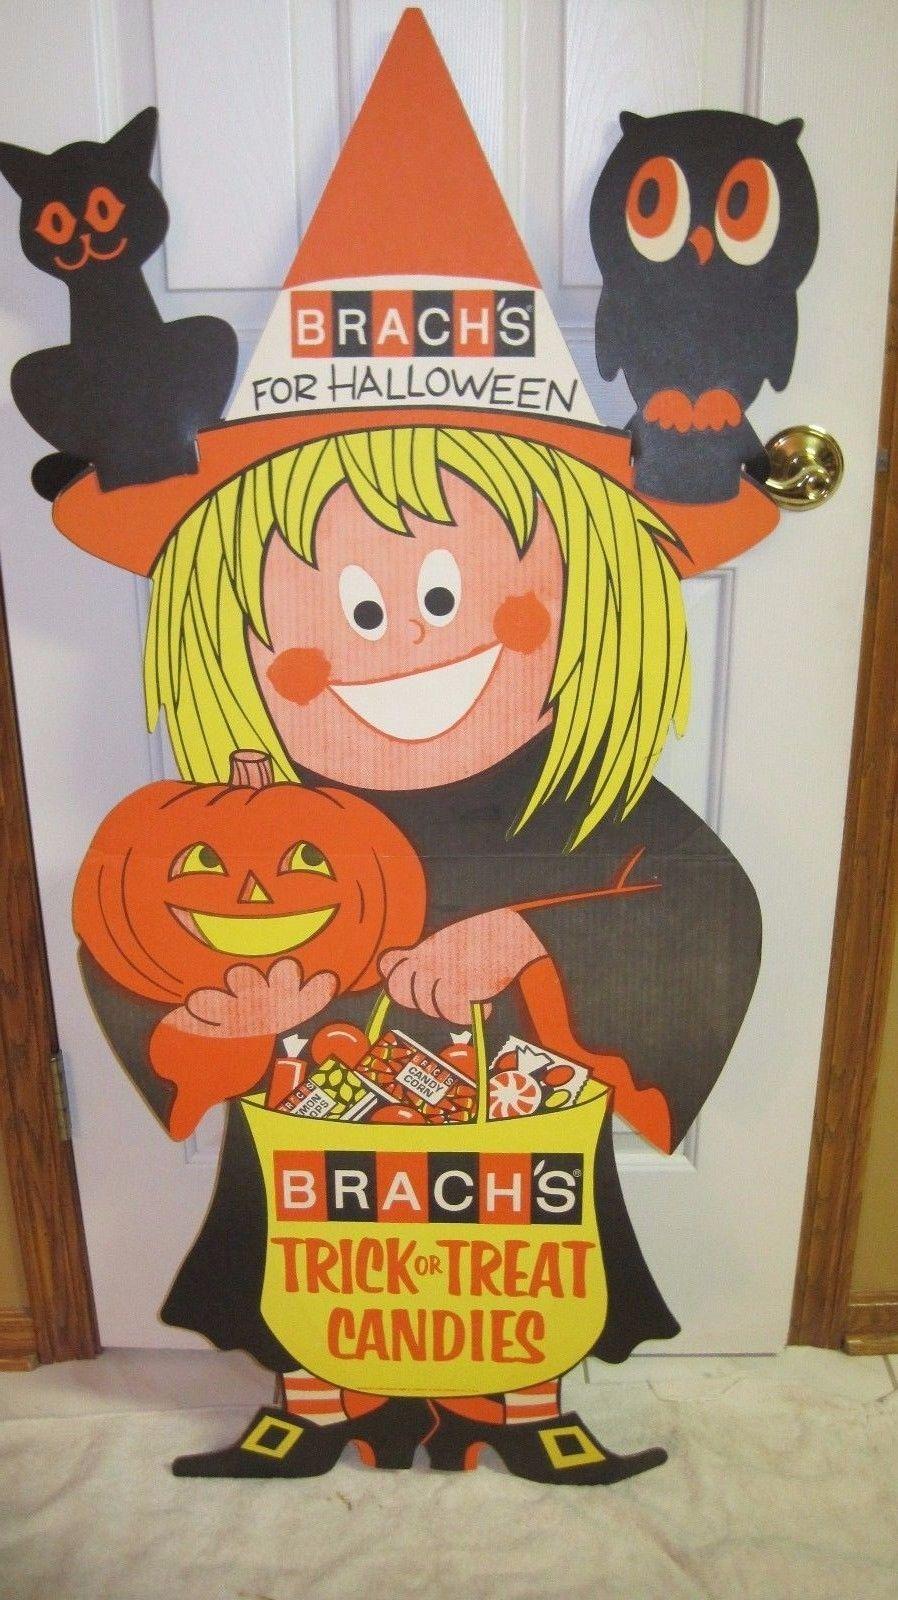 Very Rare 1969 Brachs Halloween Candy Stand Up Cardboard Display 50 Vintage Halloween Images Halloween Fun Halloween Magic